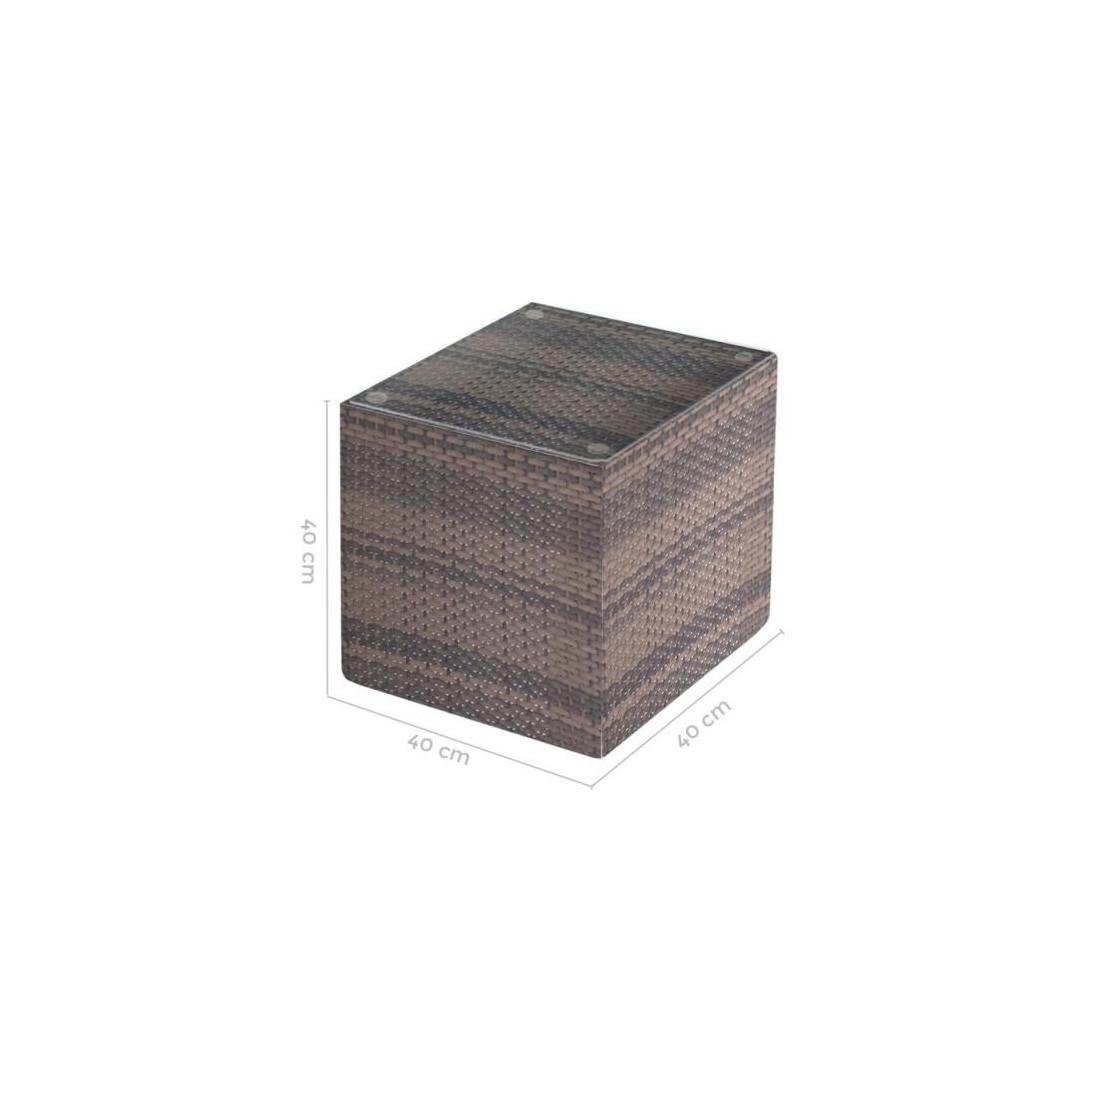 table d 39 appoint rotin taupe baros univers du jardin. Black Bedroom Furniture Sets. Home Design Ideas